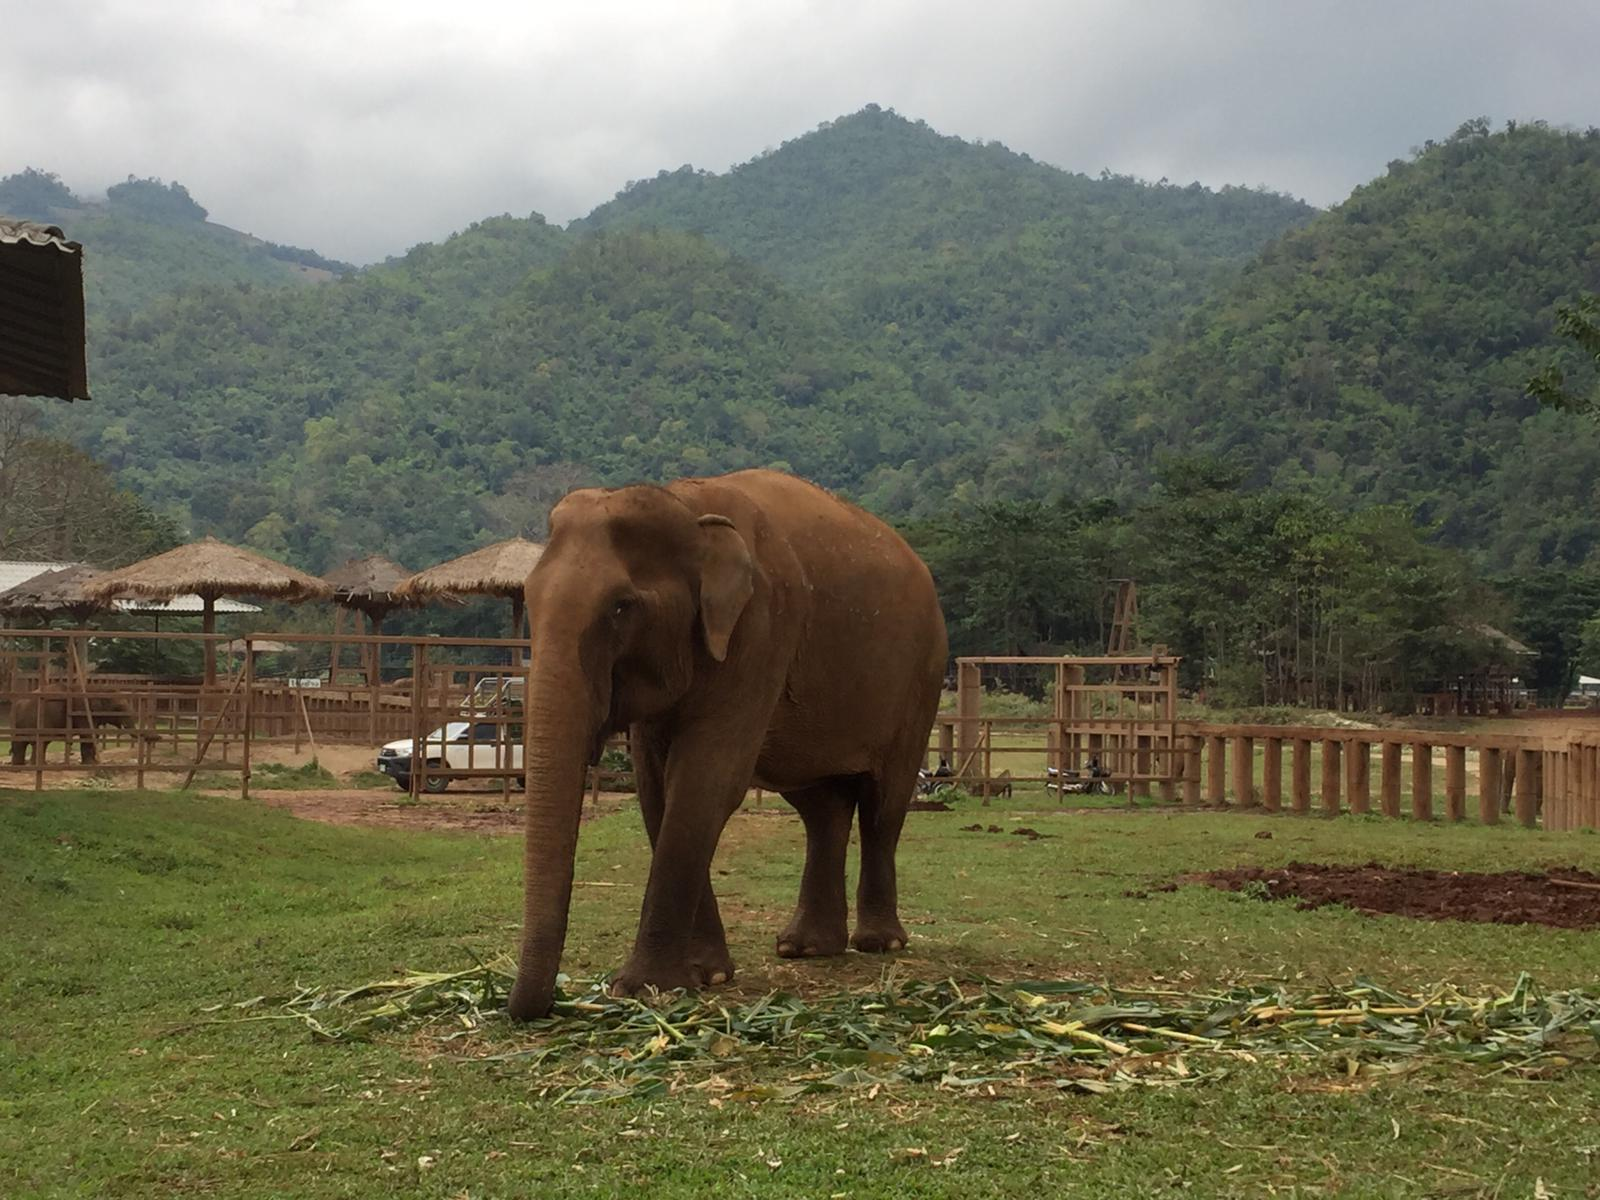 Réserve d'éléphants enThaïlande